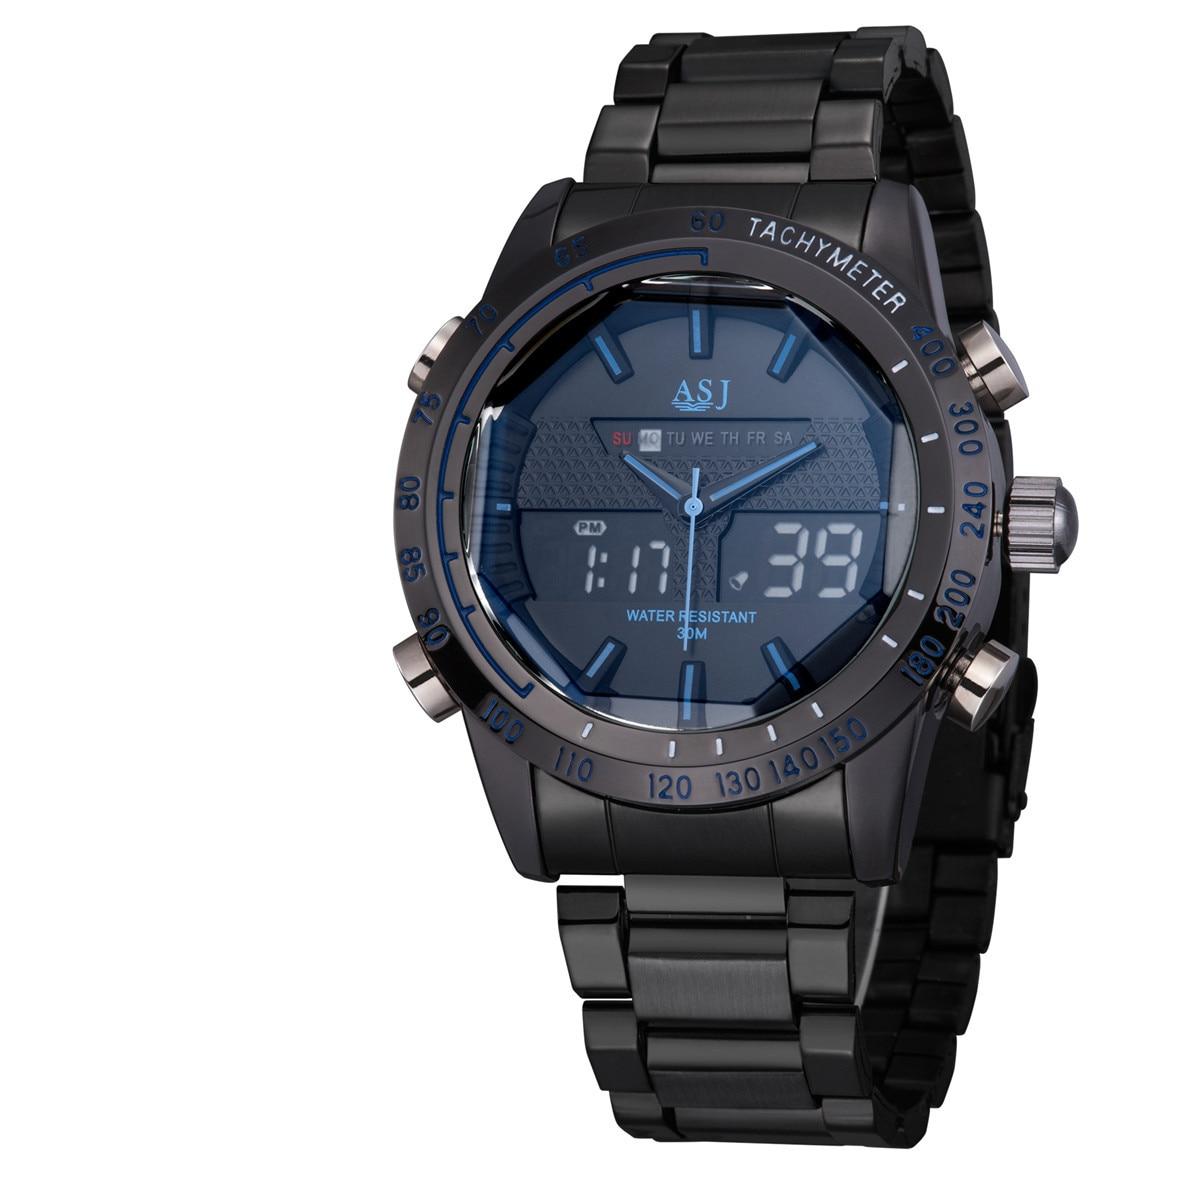 2016 Sports Watches Men Luxury Brand Asj Male Watch Analog